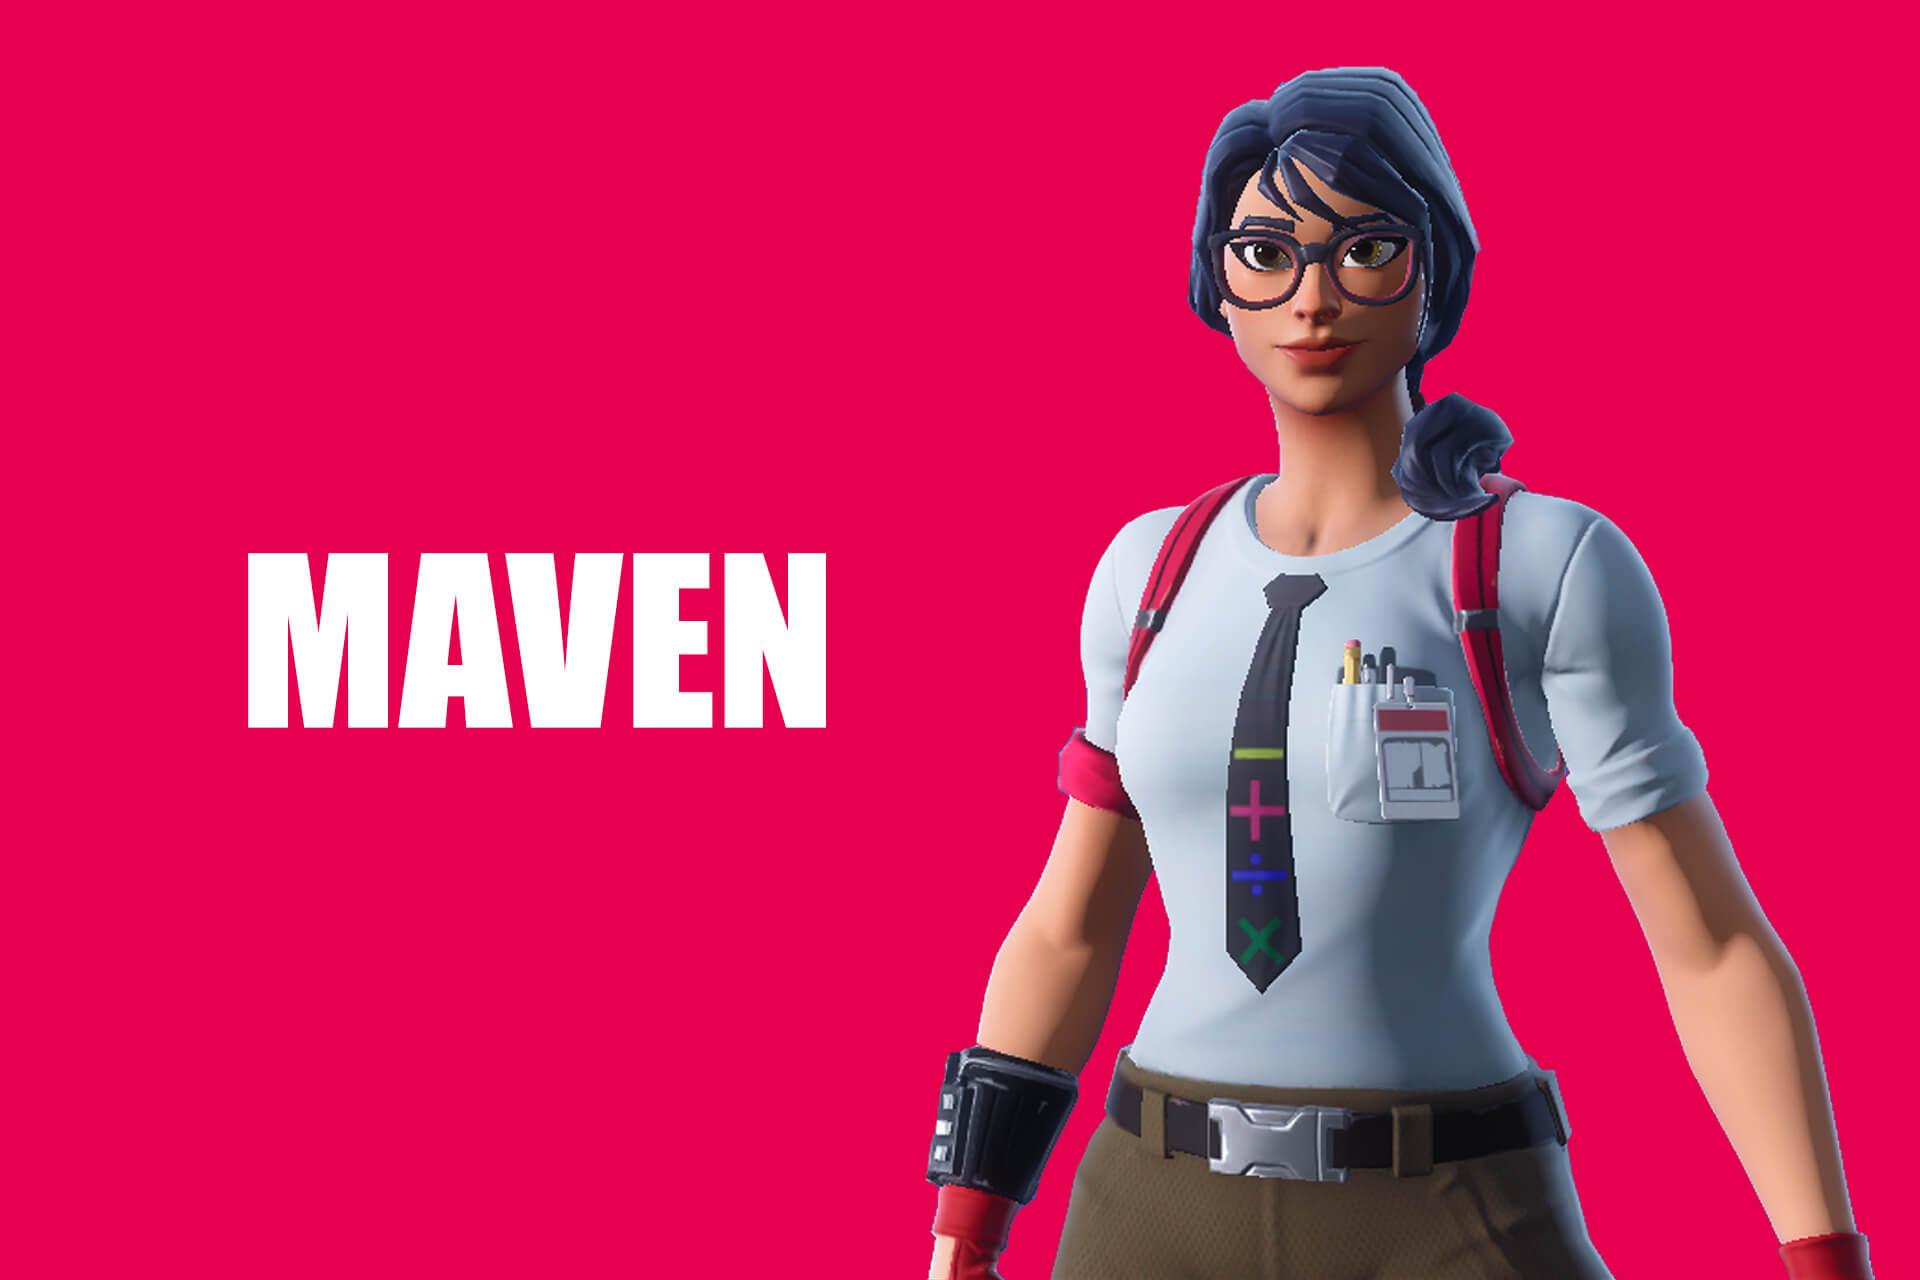 costume-maven1